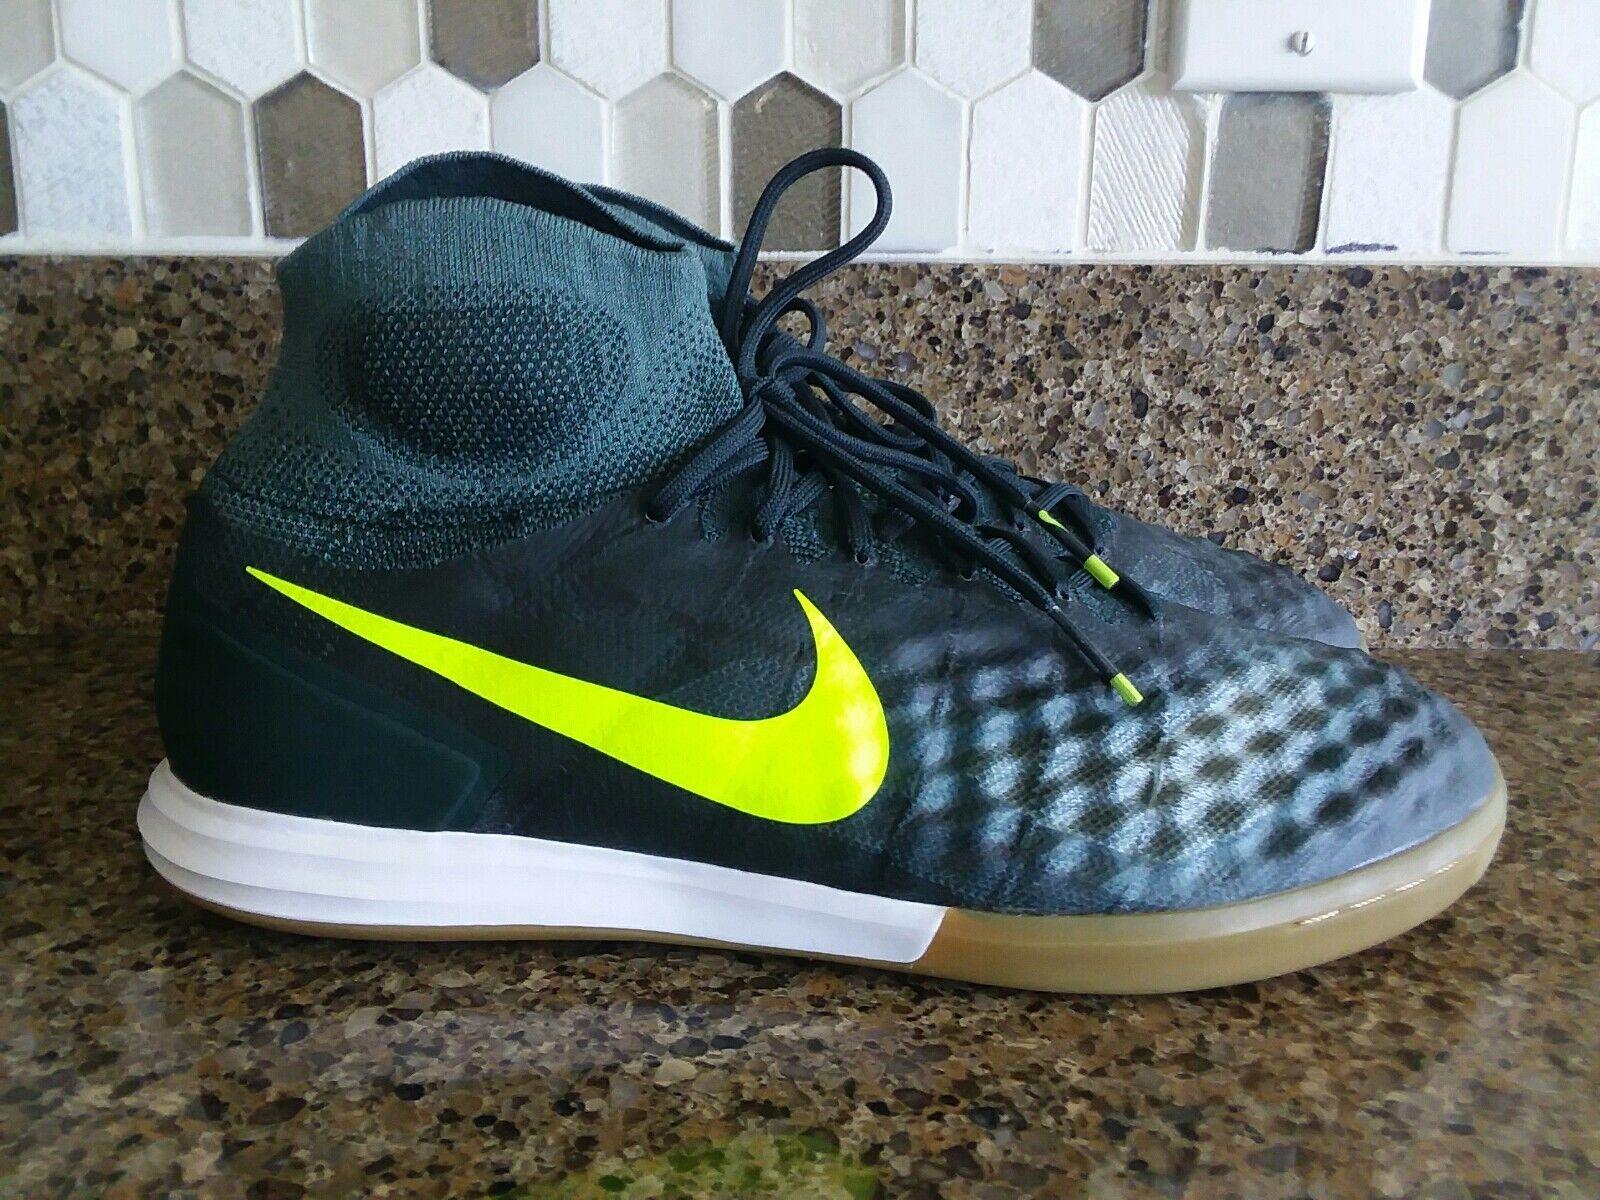 Nike MagistaX Proximo II IC Soccer Shoes Seaweed/Volt Sz 10, 11